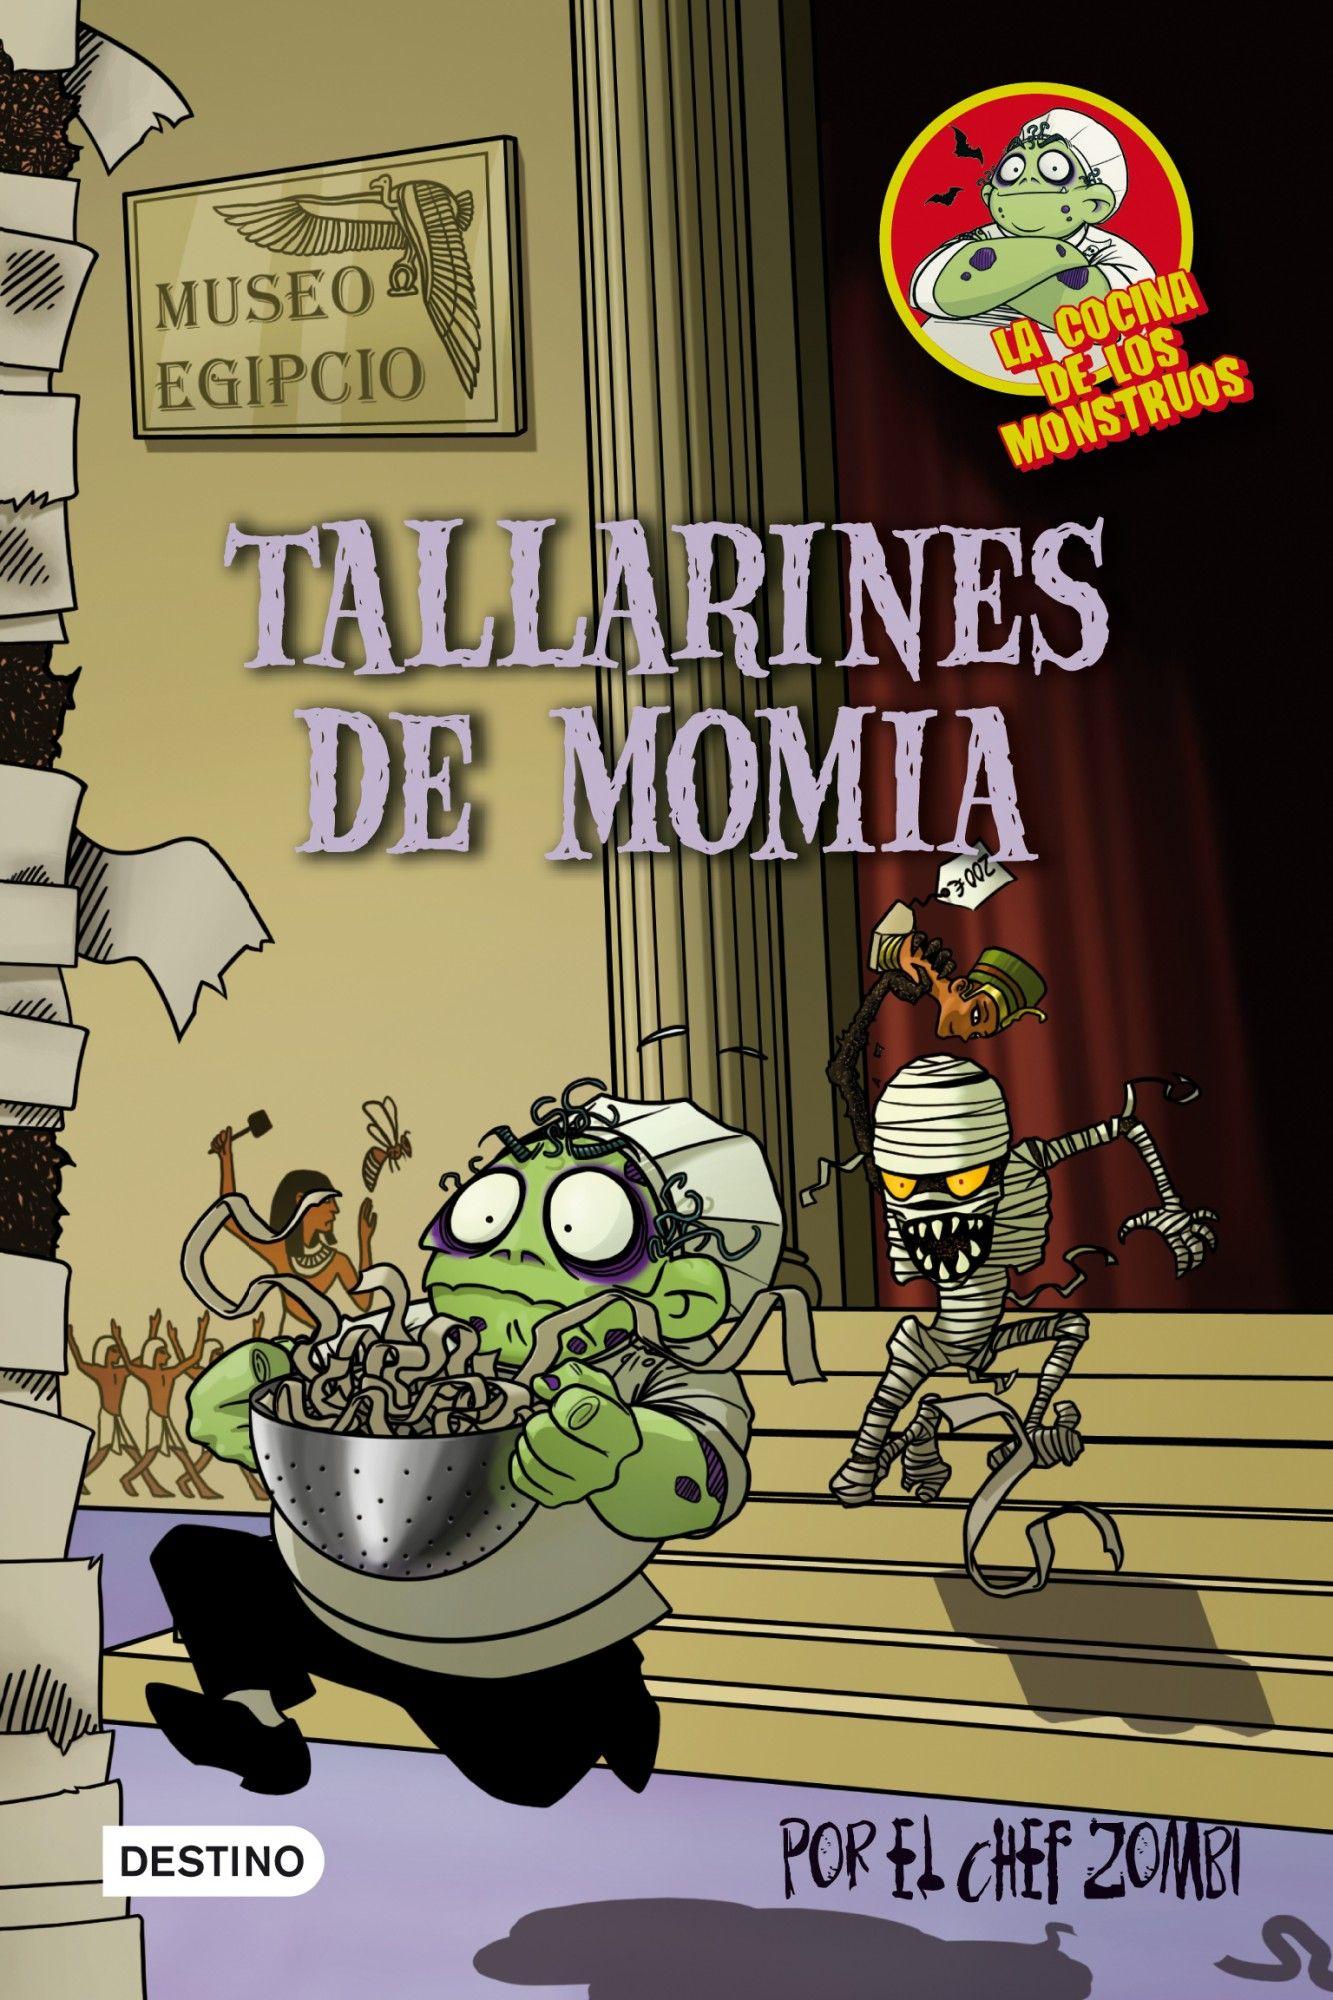 TALLARINES DE MOMIA